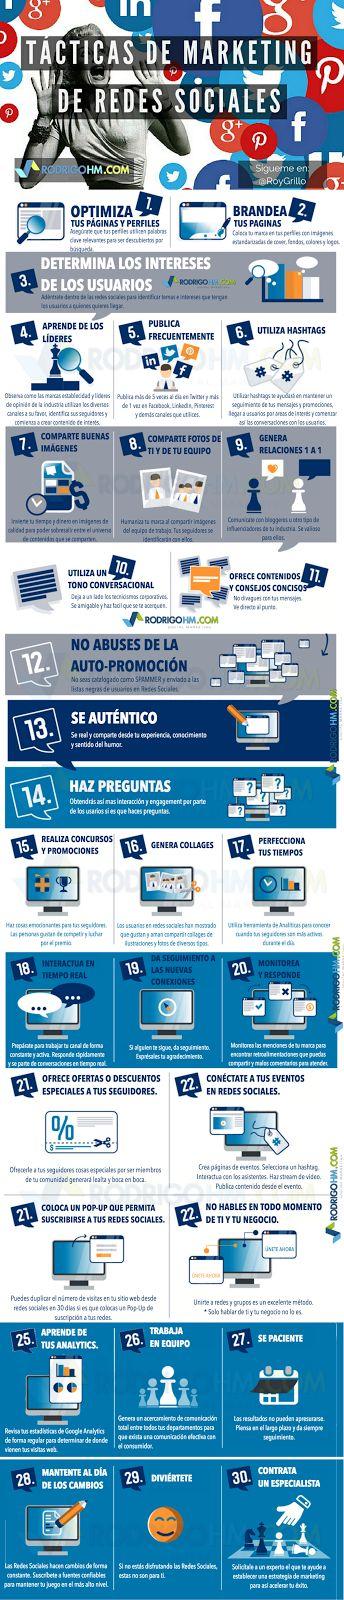 Tácticas de #Marketing de #RedesSociales #infografia en español